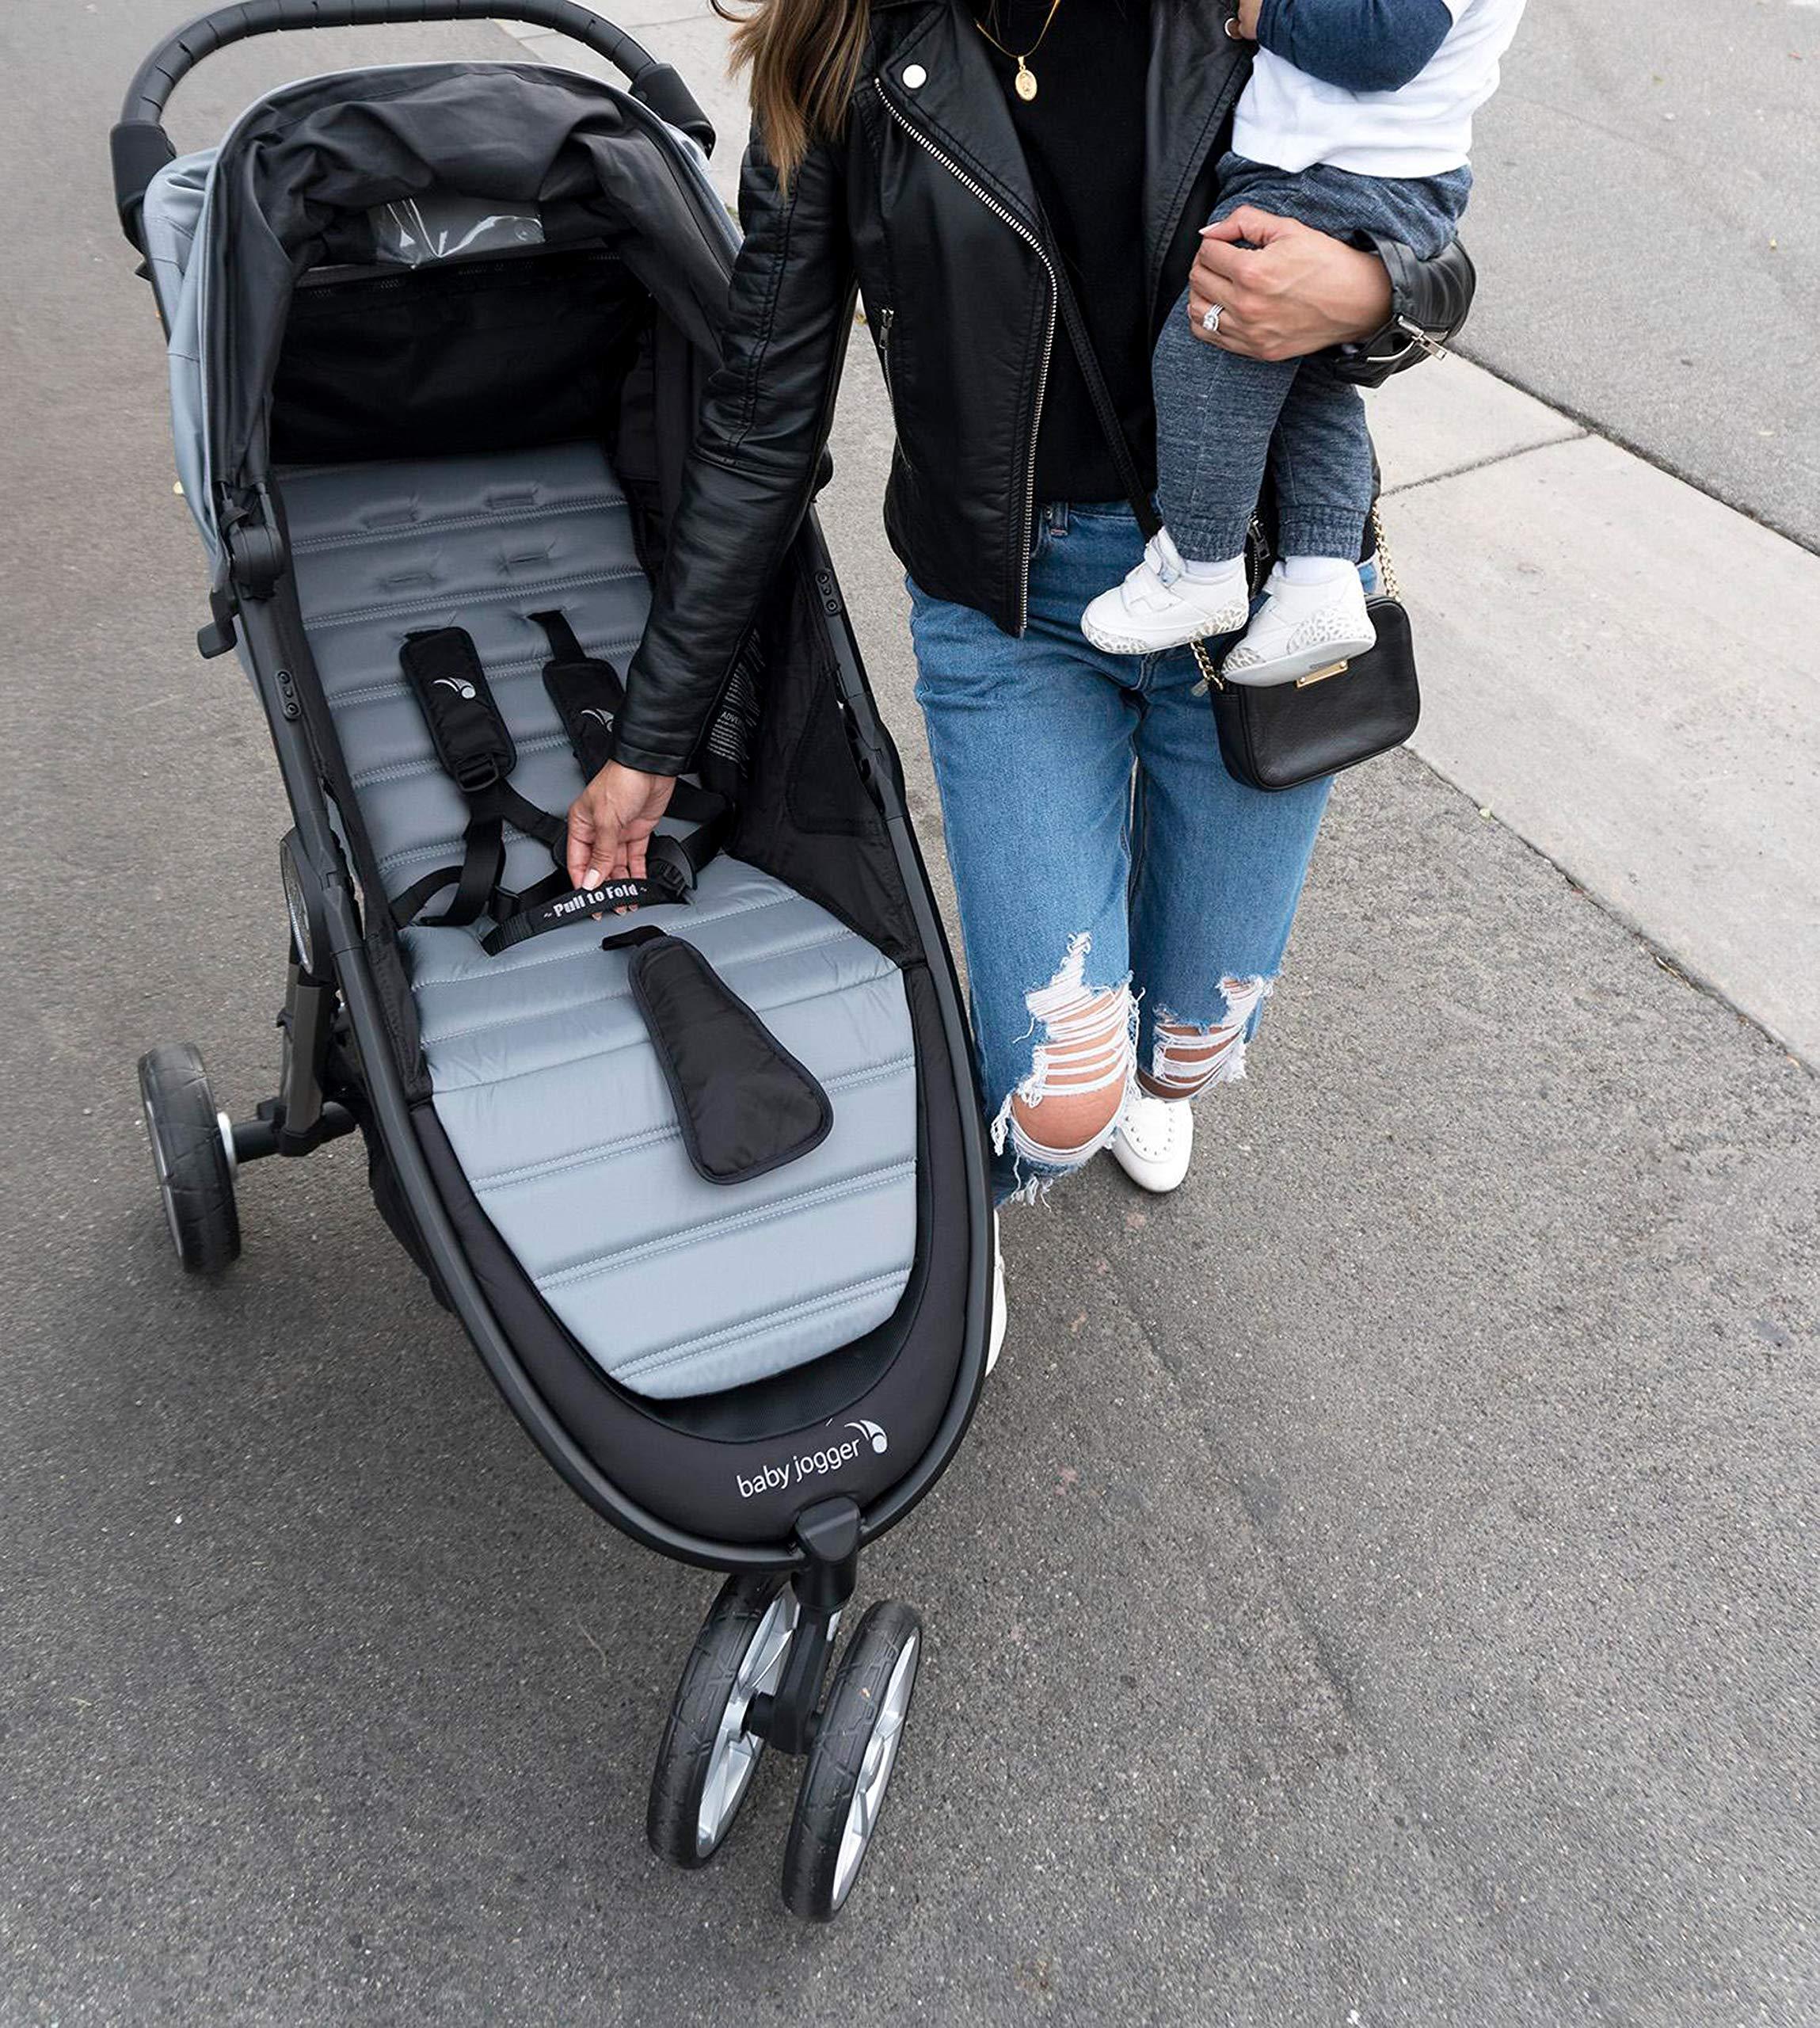 Baby Jogger City Mini 2 Stroller - 2019   Compact, Lightweight Stroller   Quick Fold Baby Stroller, Carbon by Baby Jogger (Image #12)